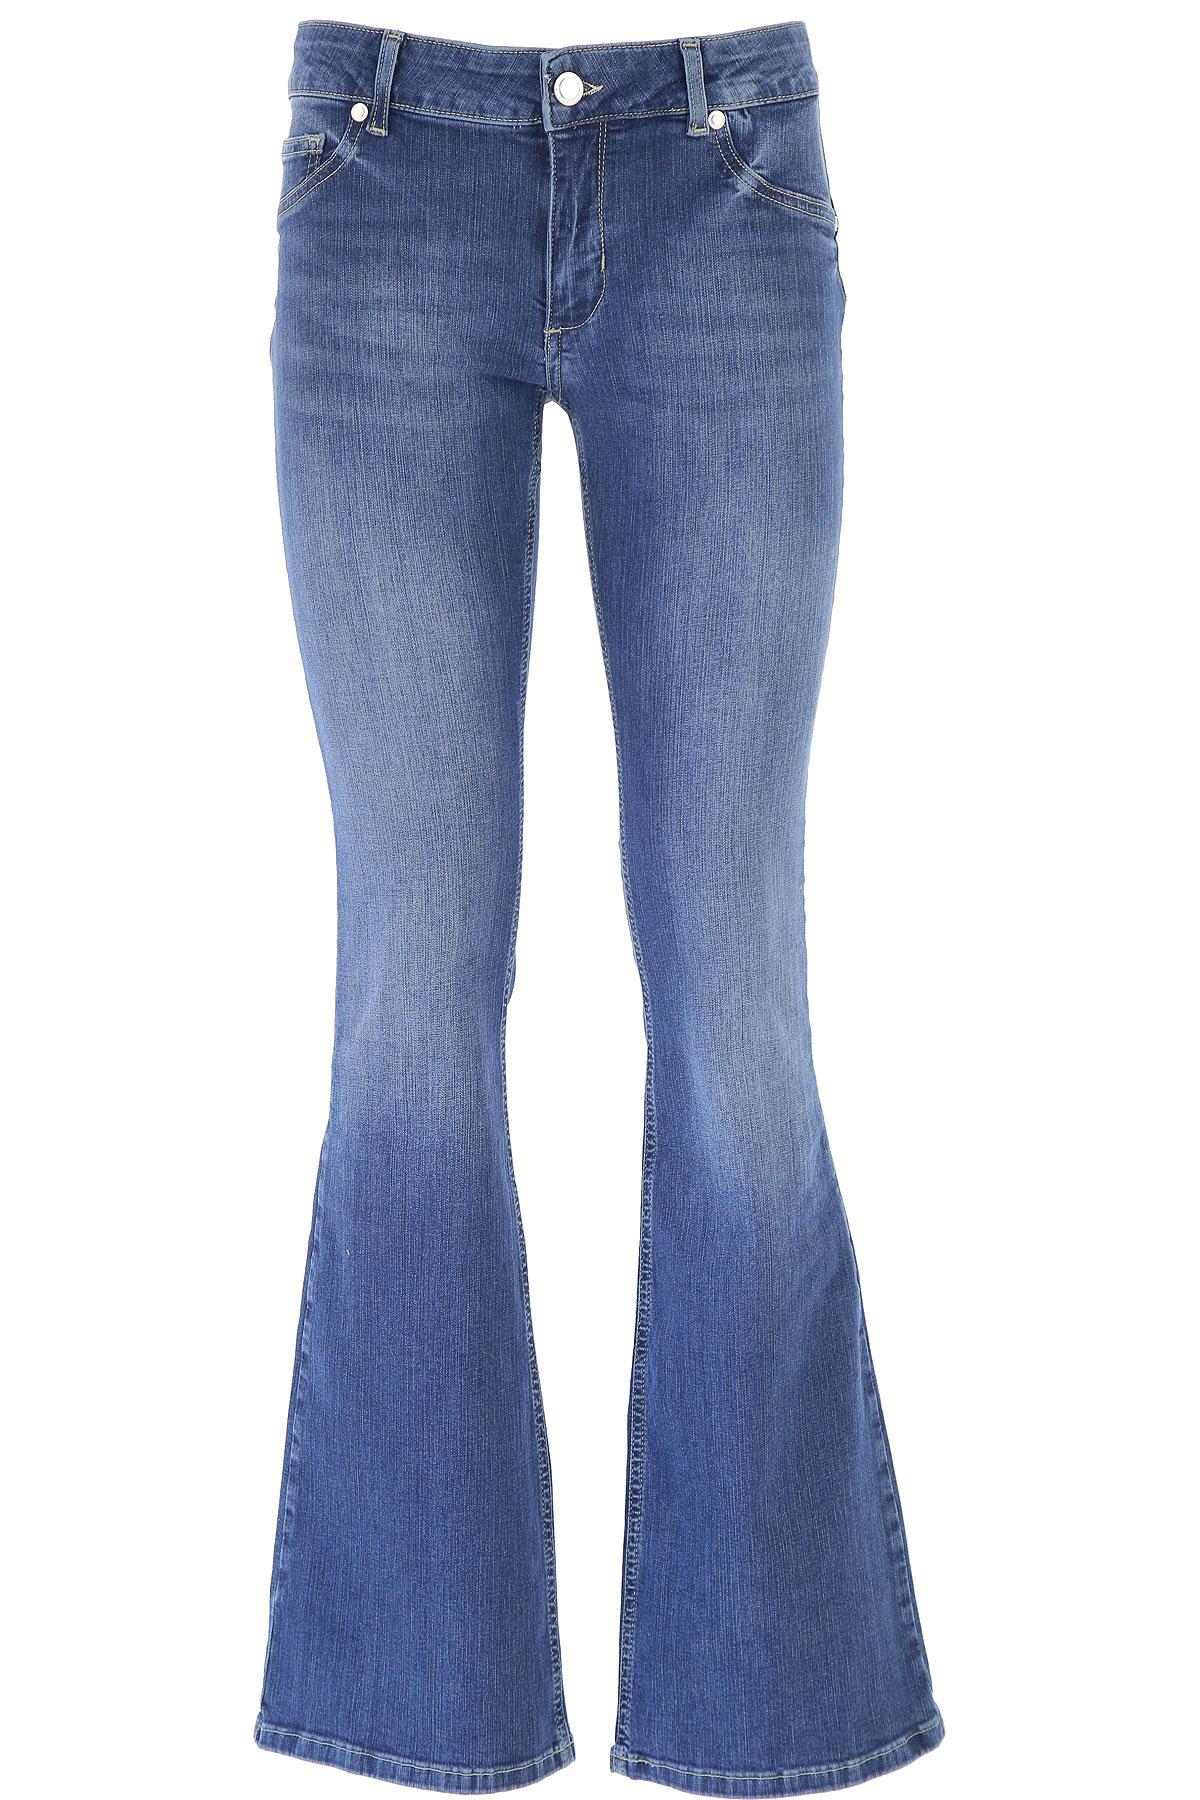 Silvian Heach Jeans On Sale, Denim Blue, Cotton, 2019, 27 30 31